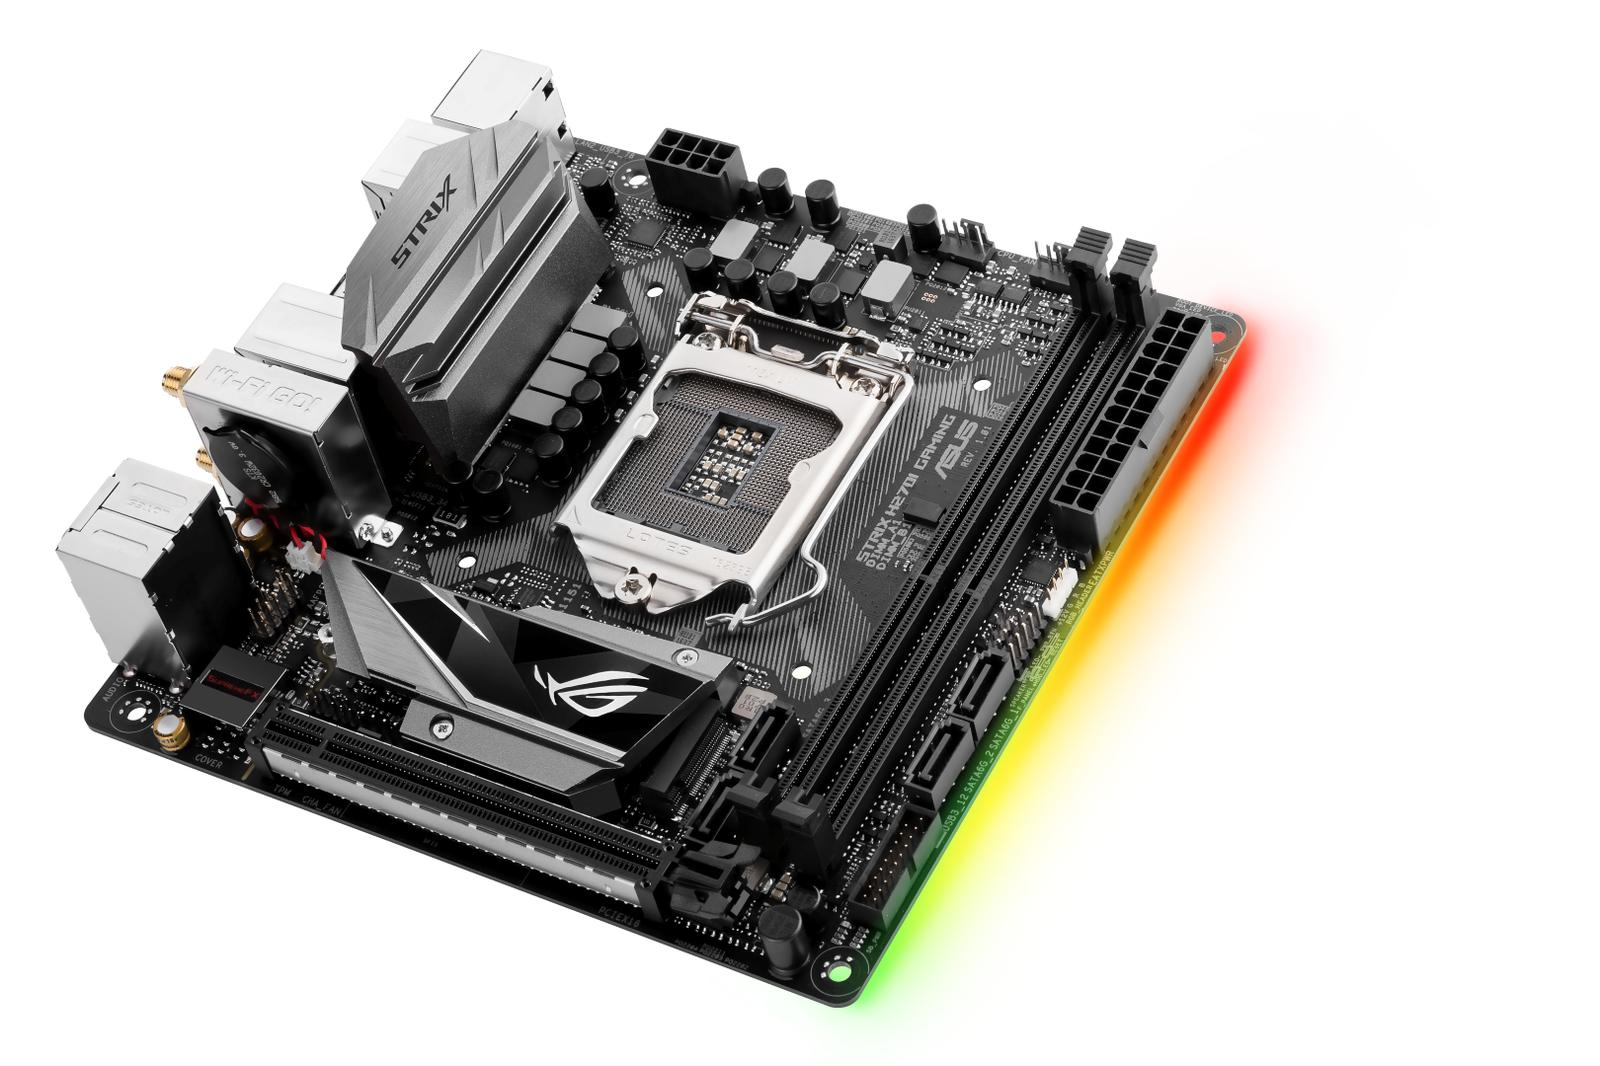 Asus ROG STRIX H270I GAMING Mini ITX LGA 1151